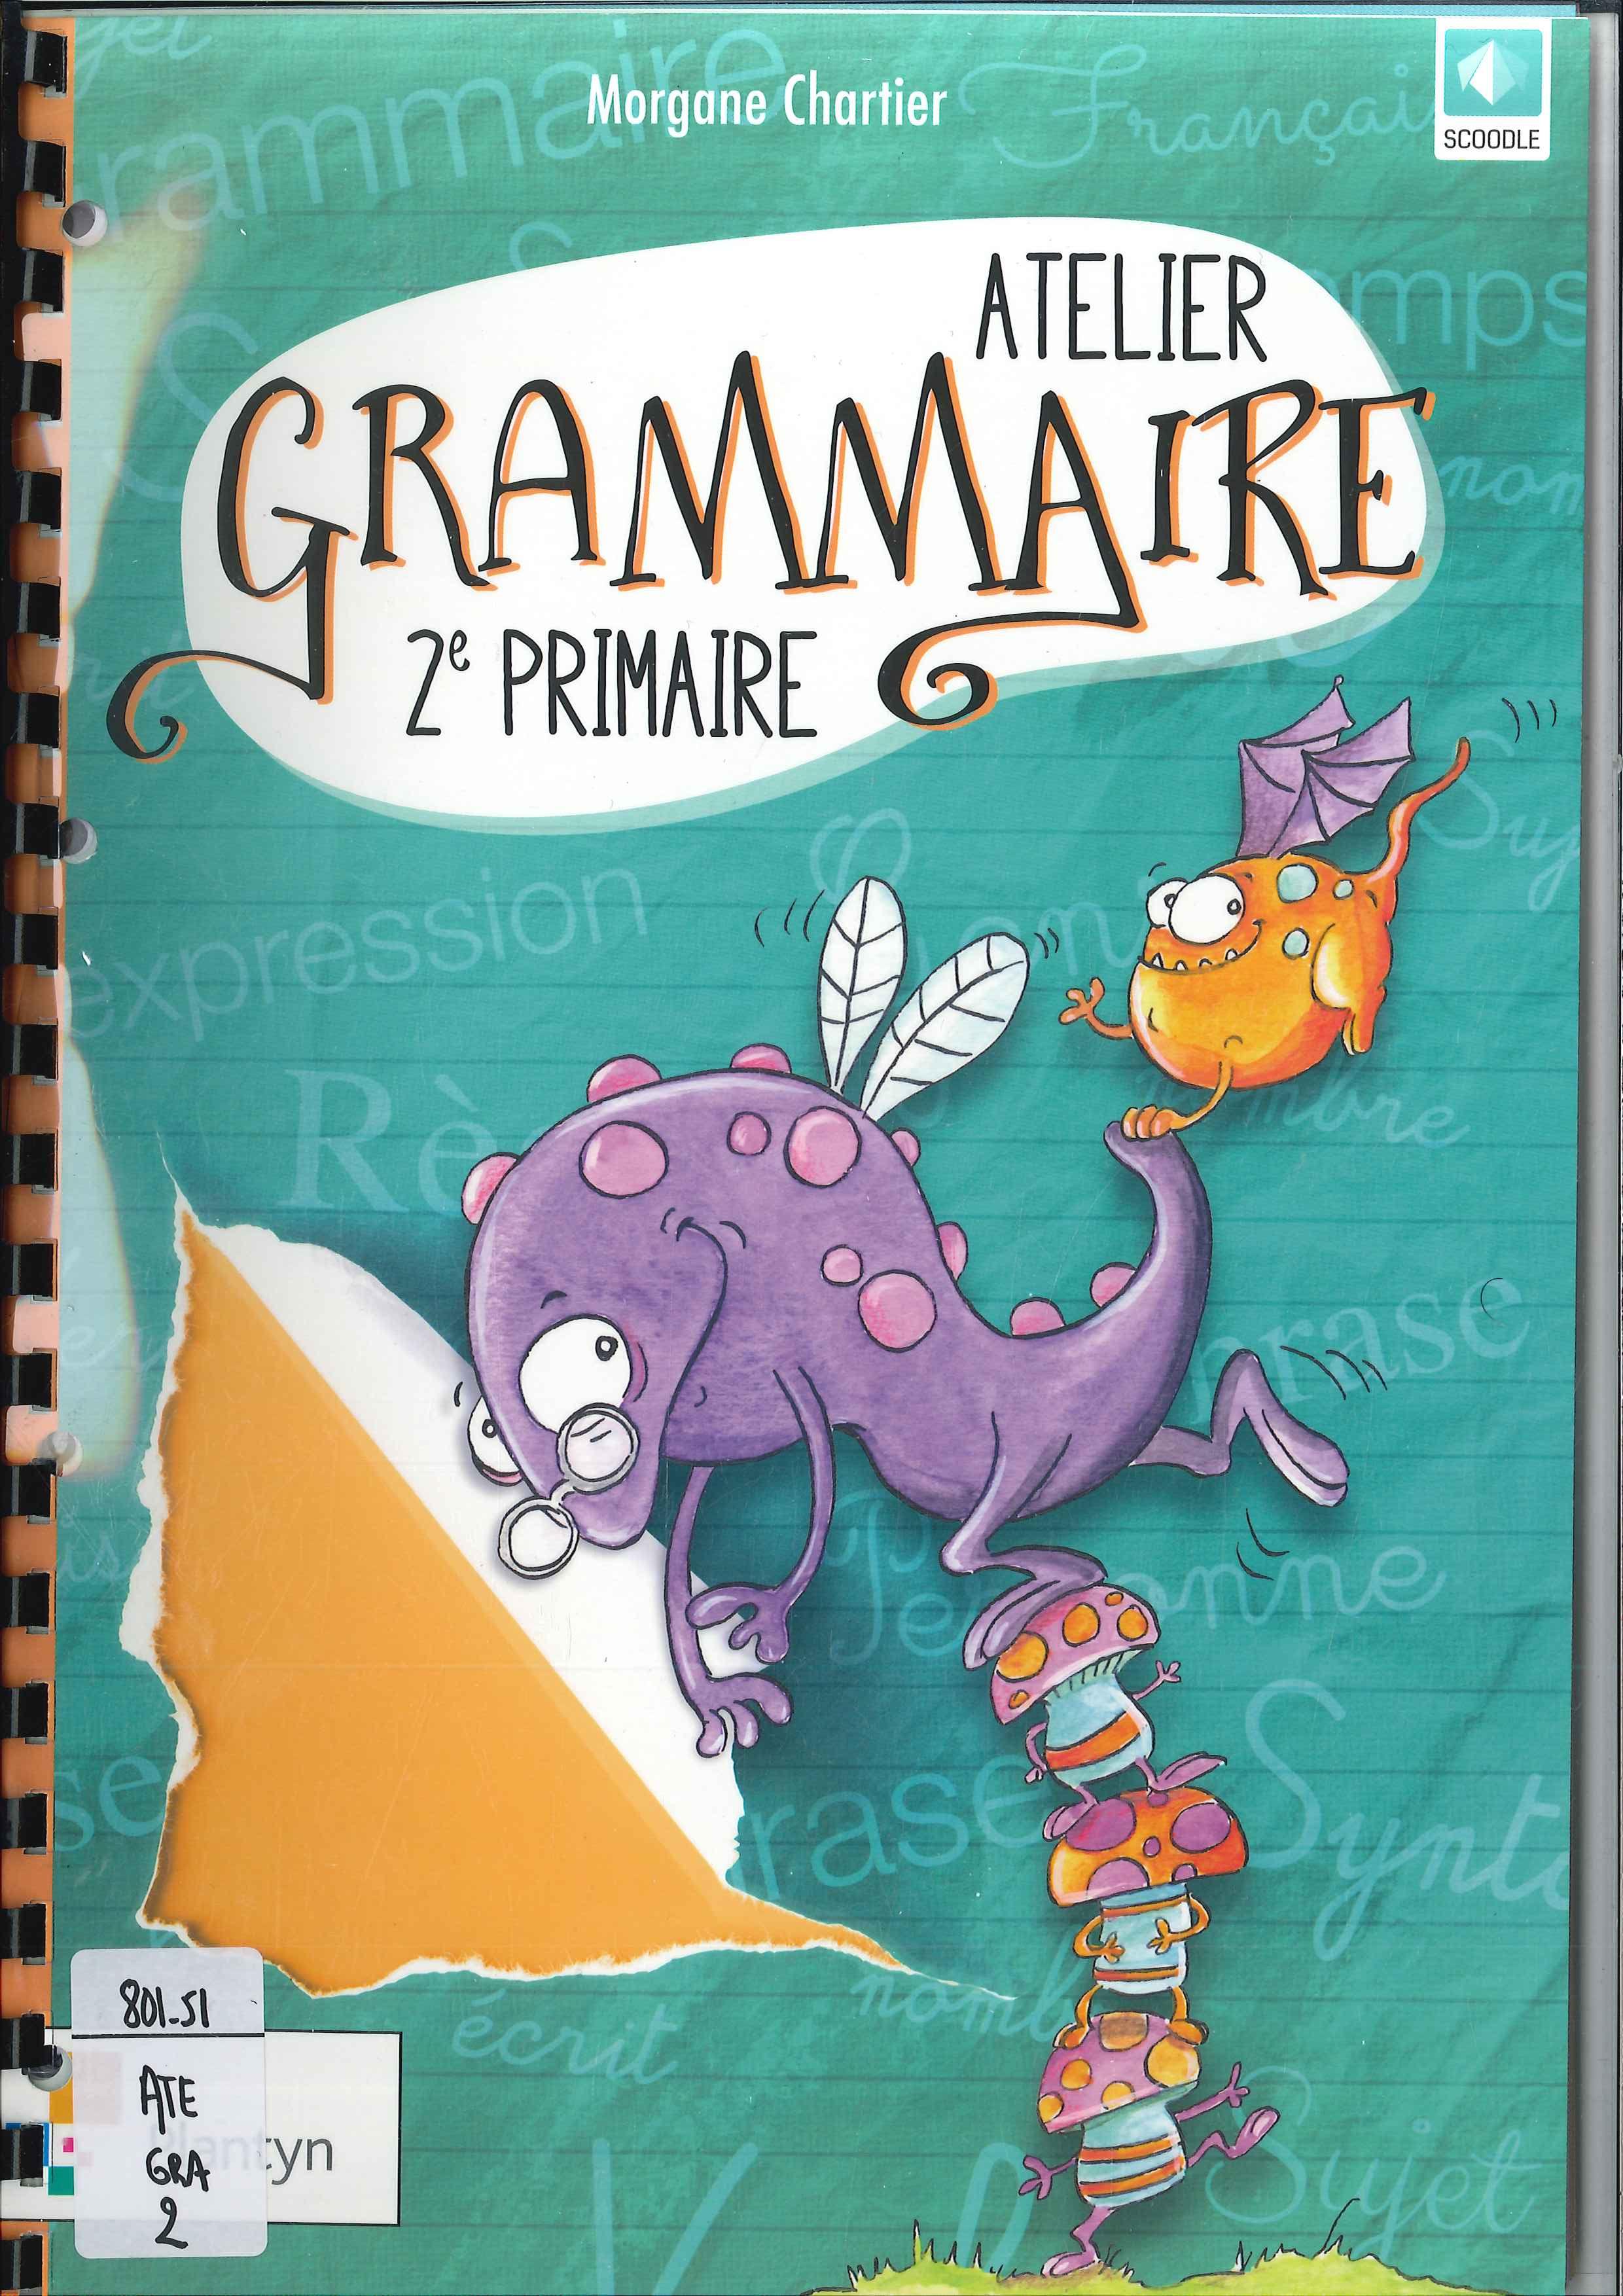 Atelier grammaire. 2e primaire